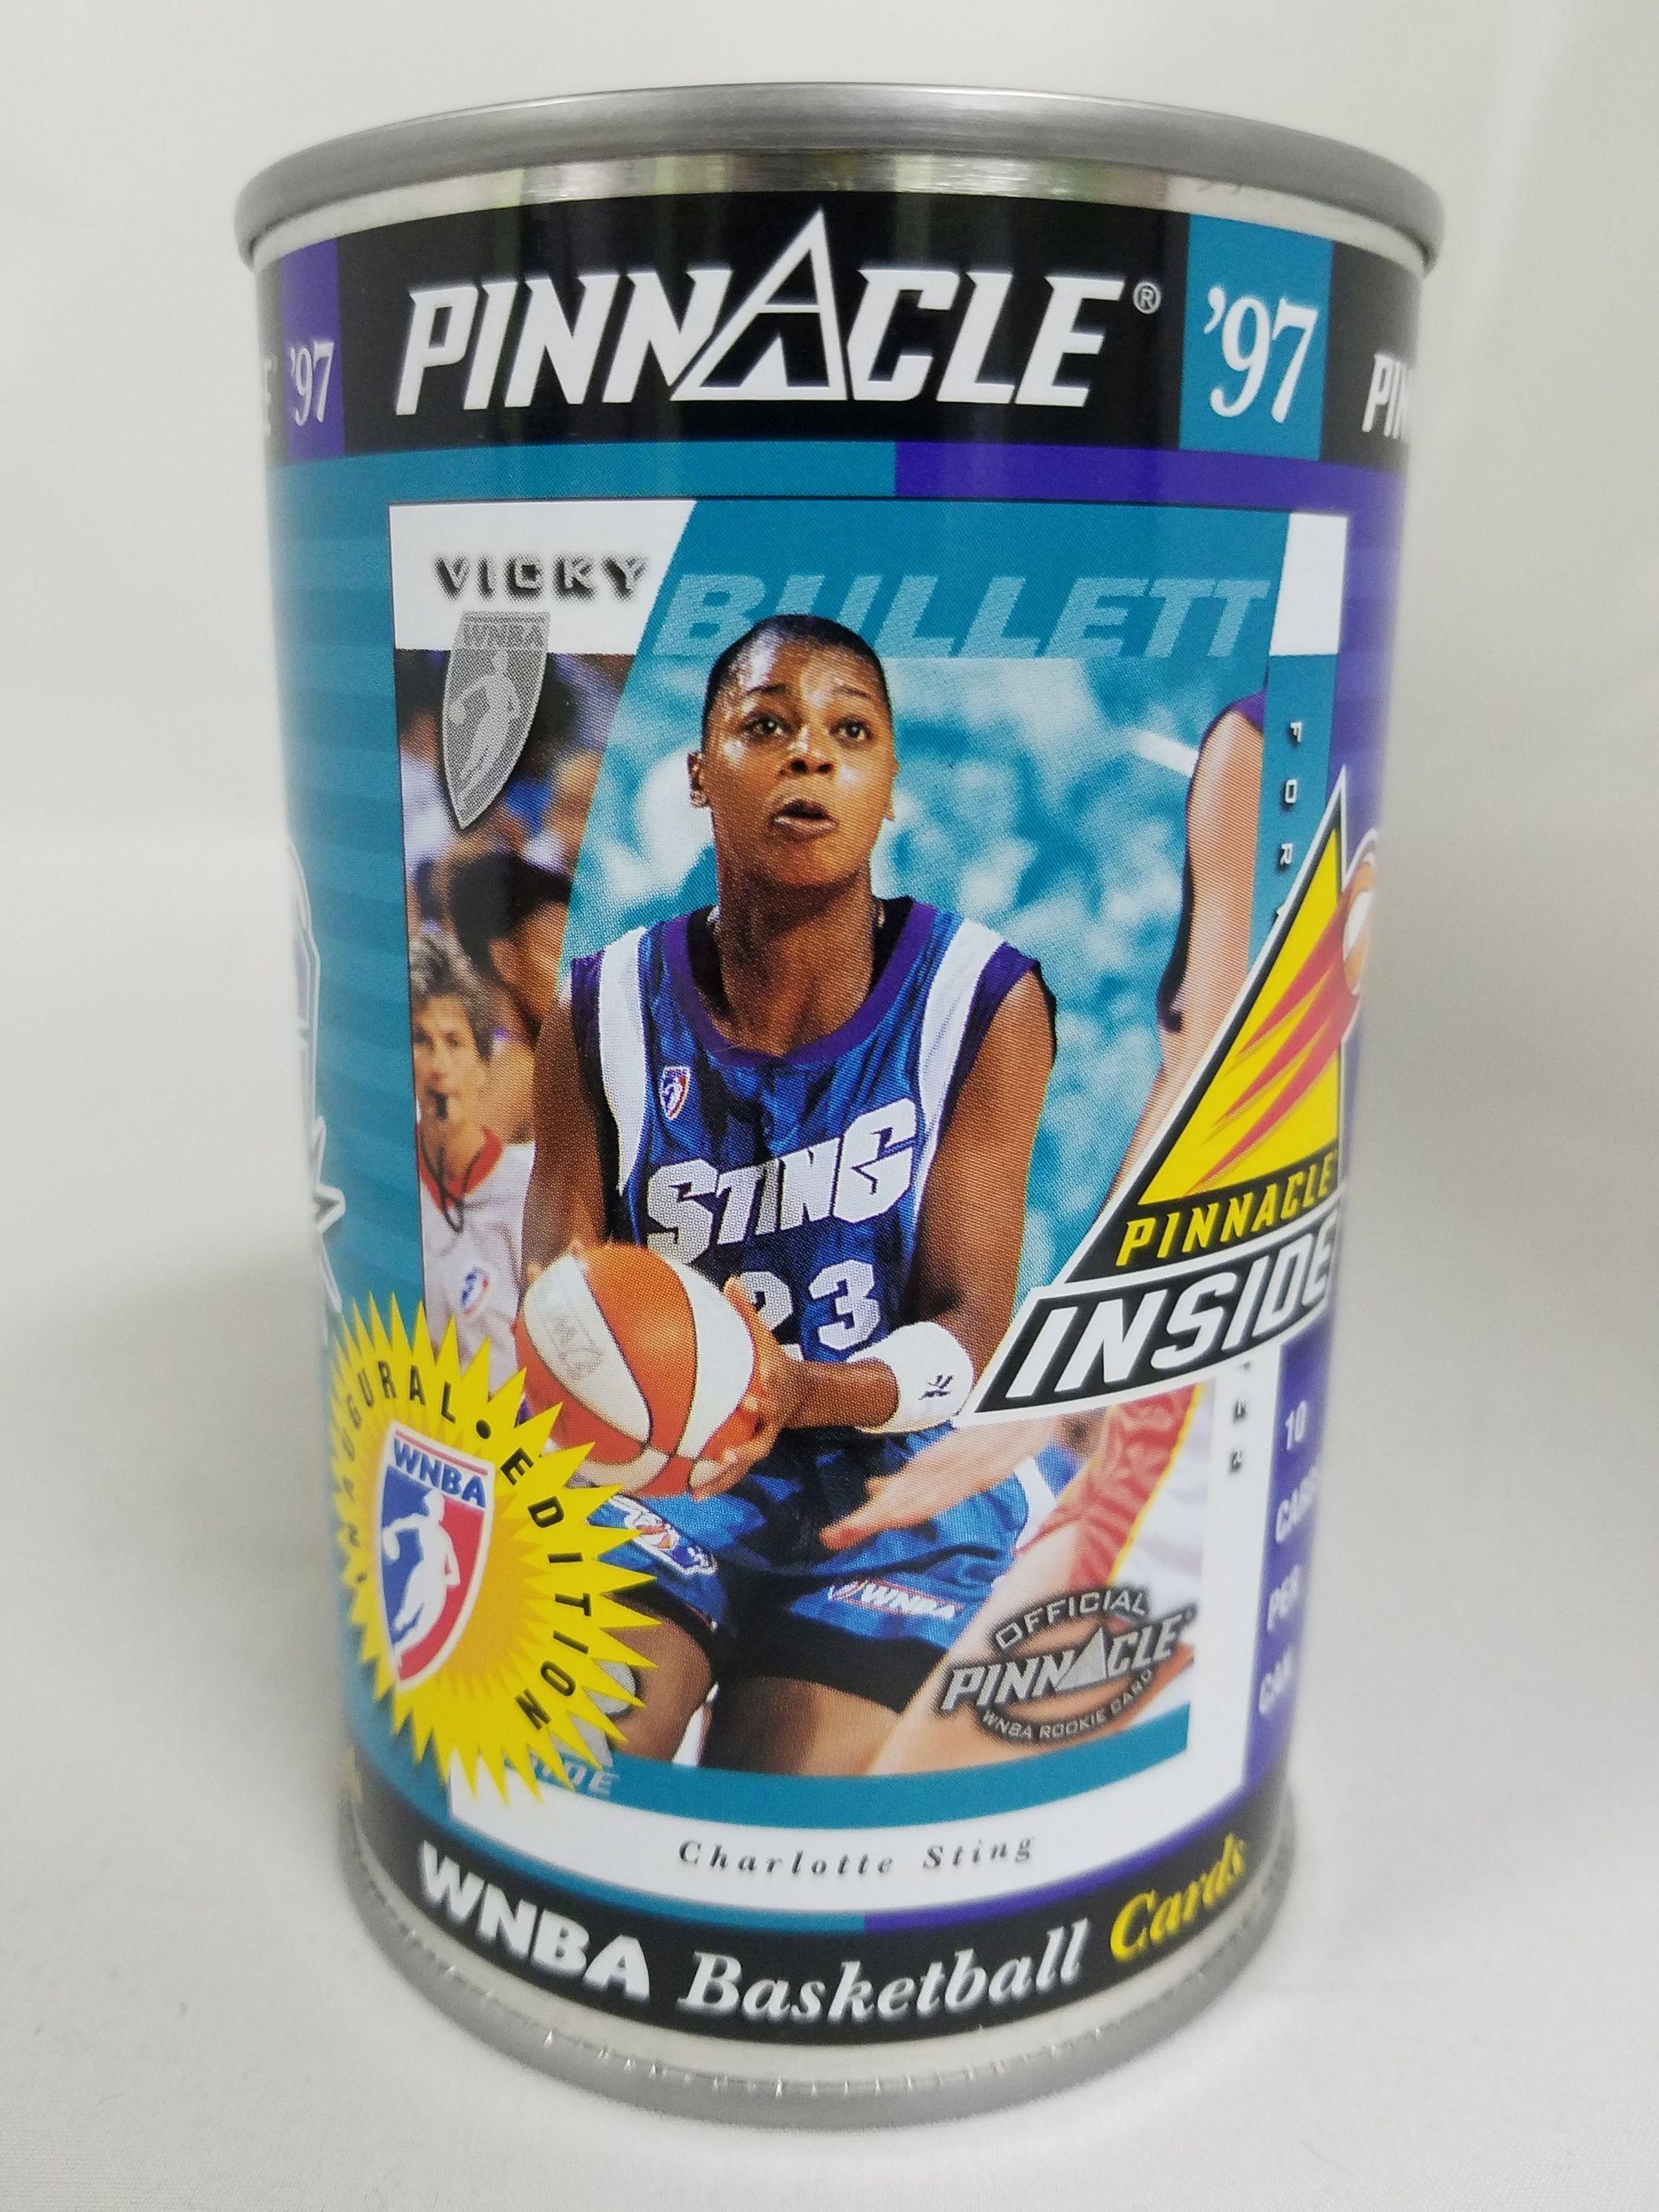 1997 Pinnacle Inside WNBA Cans #2 Vicky Bullett